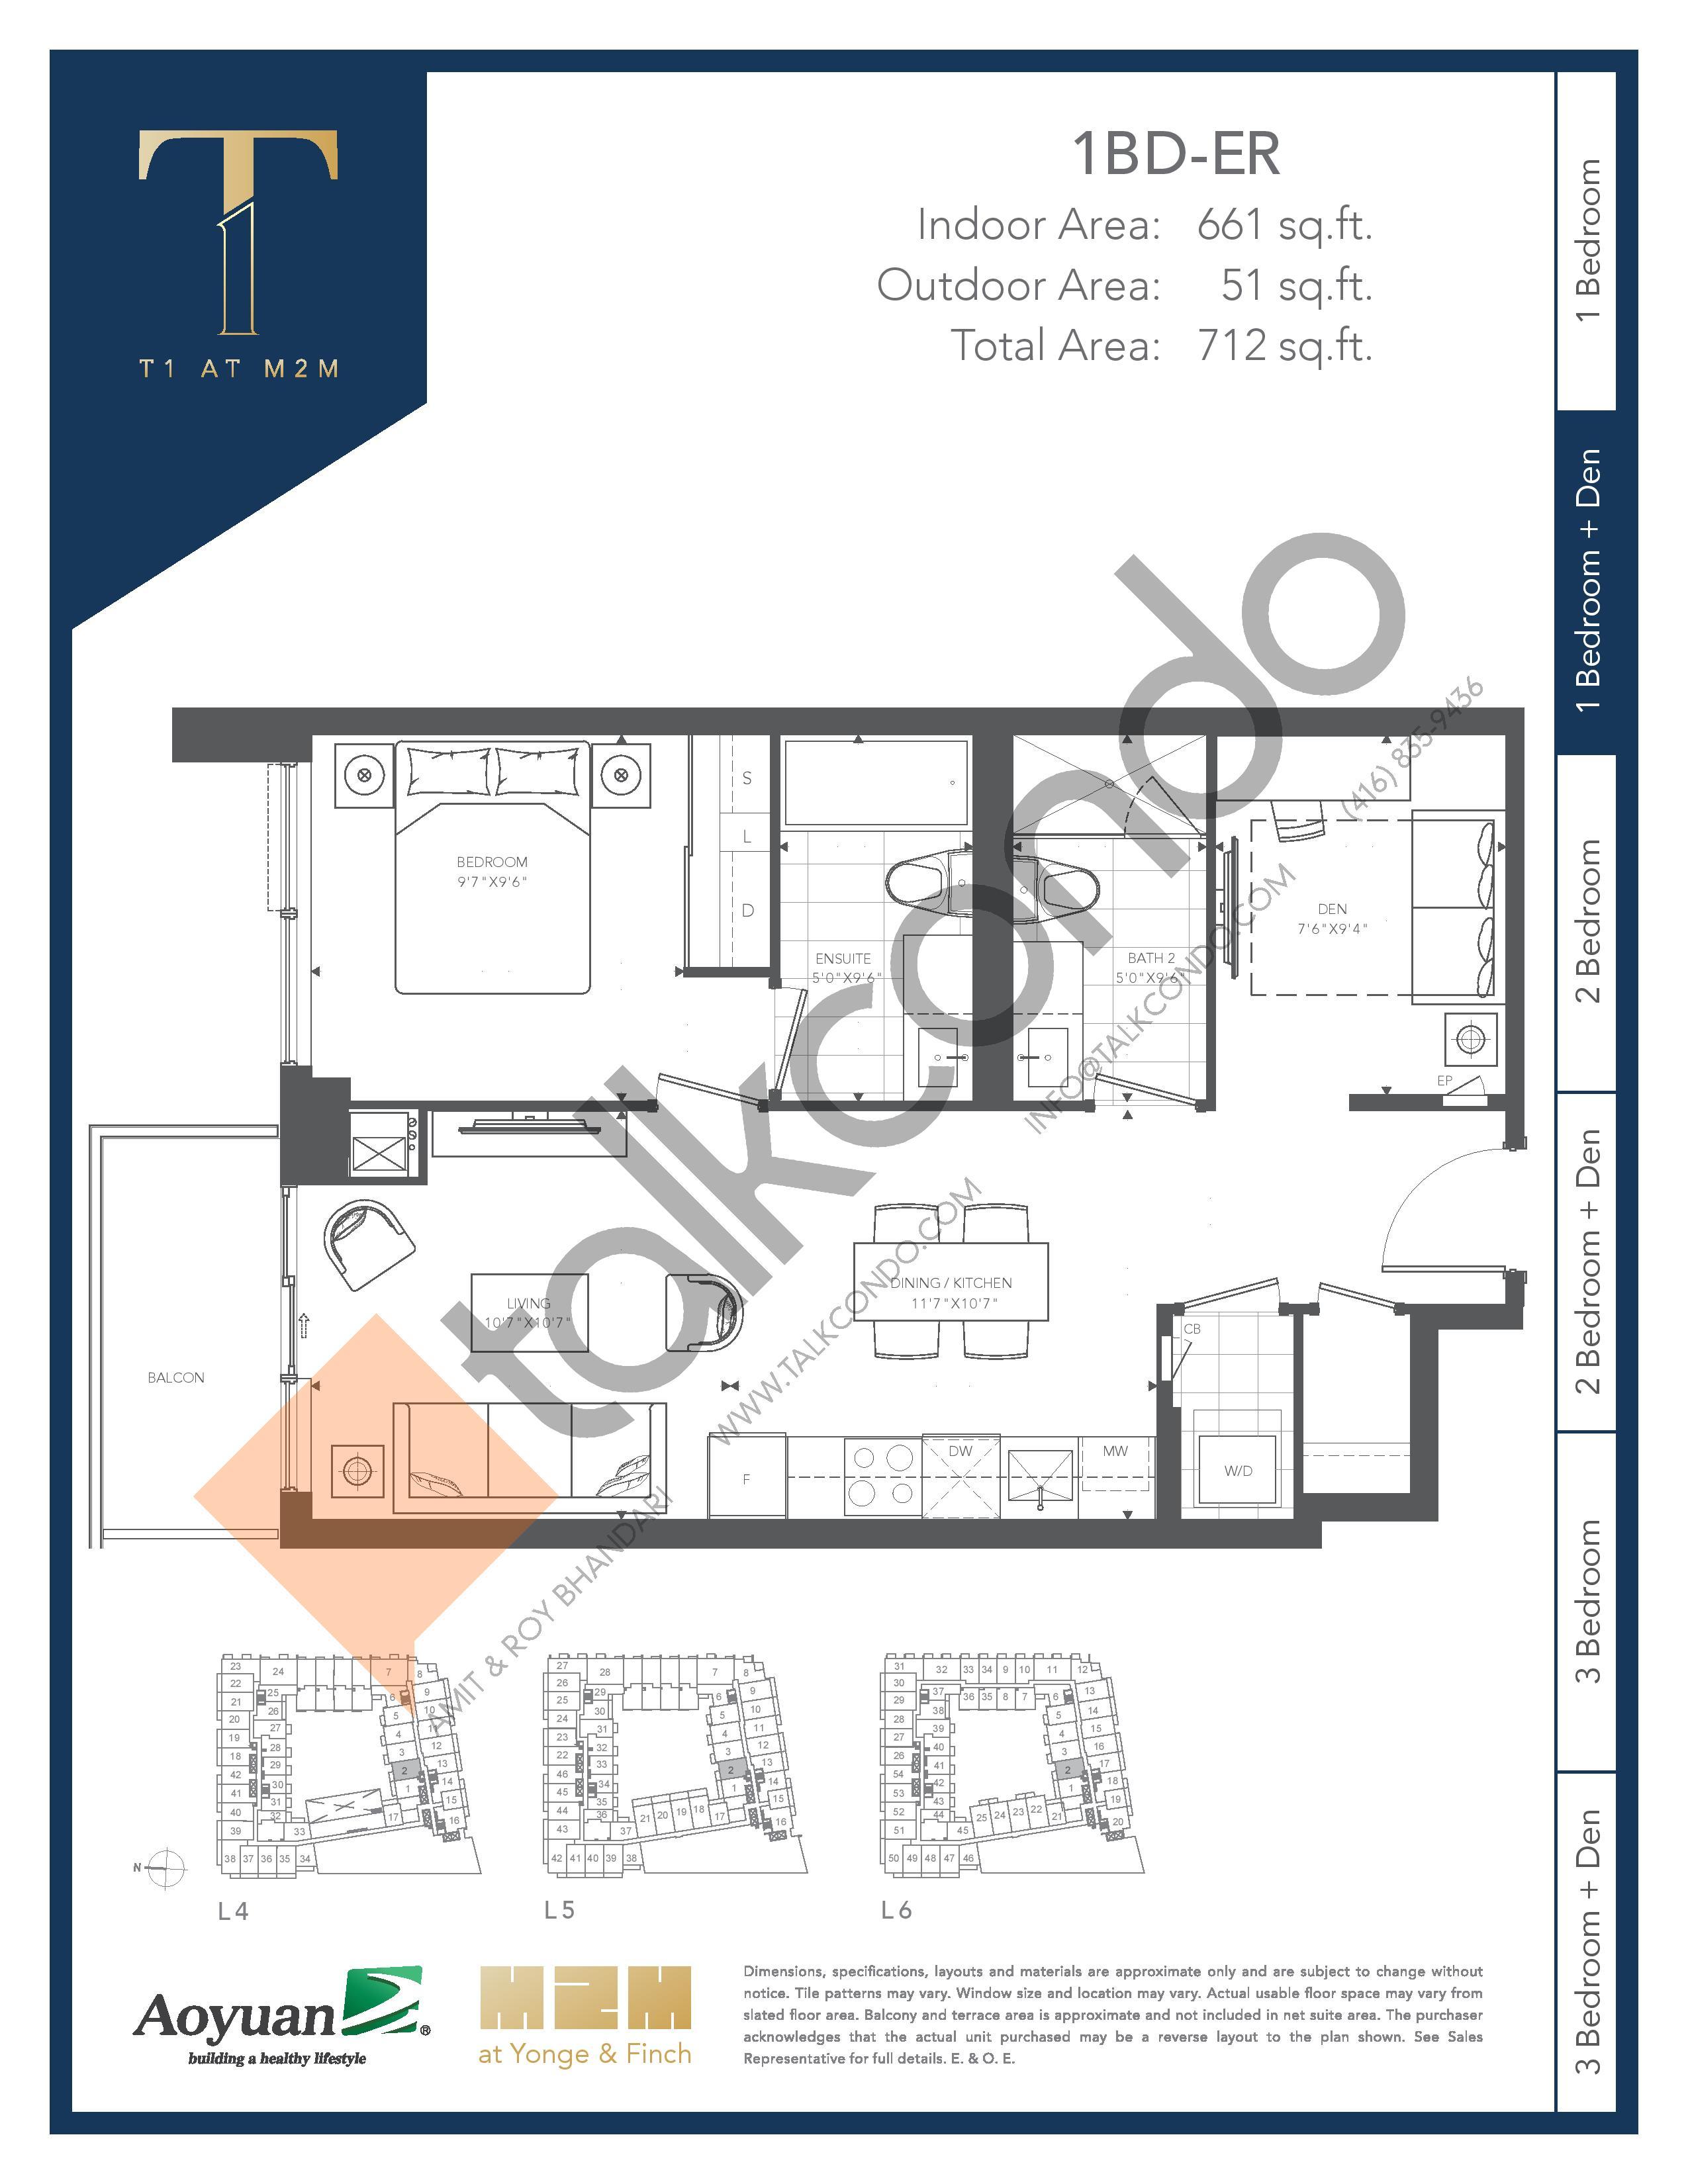 1BD-ER (Podium) Floor Plan at T1 at M2M Condos - 661 sq.ft